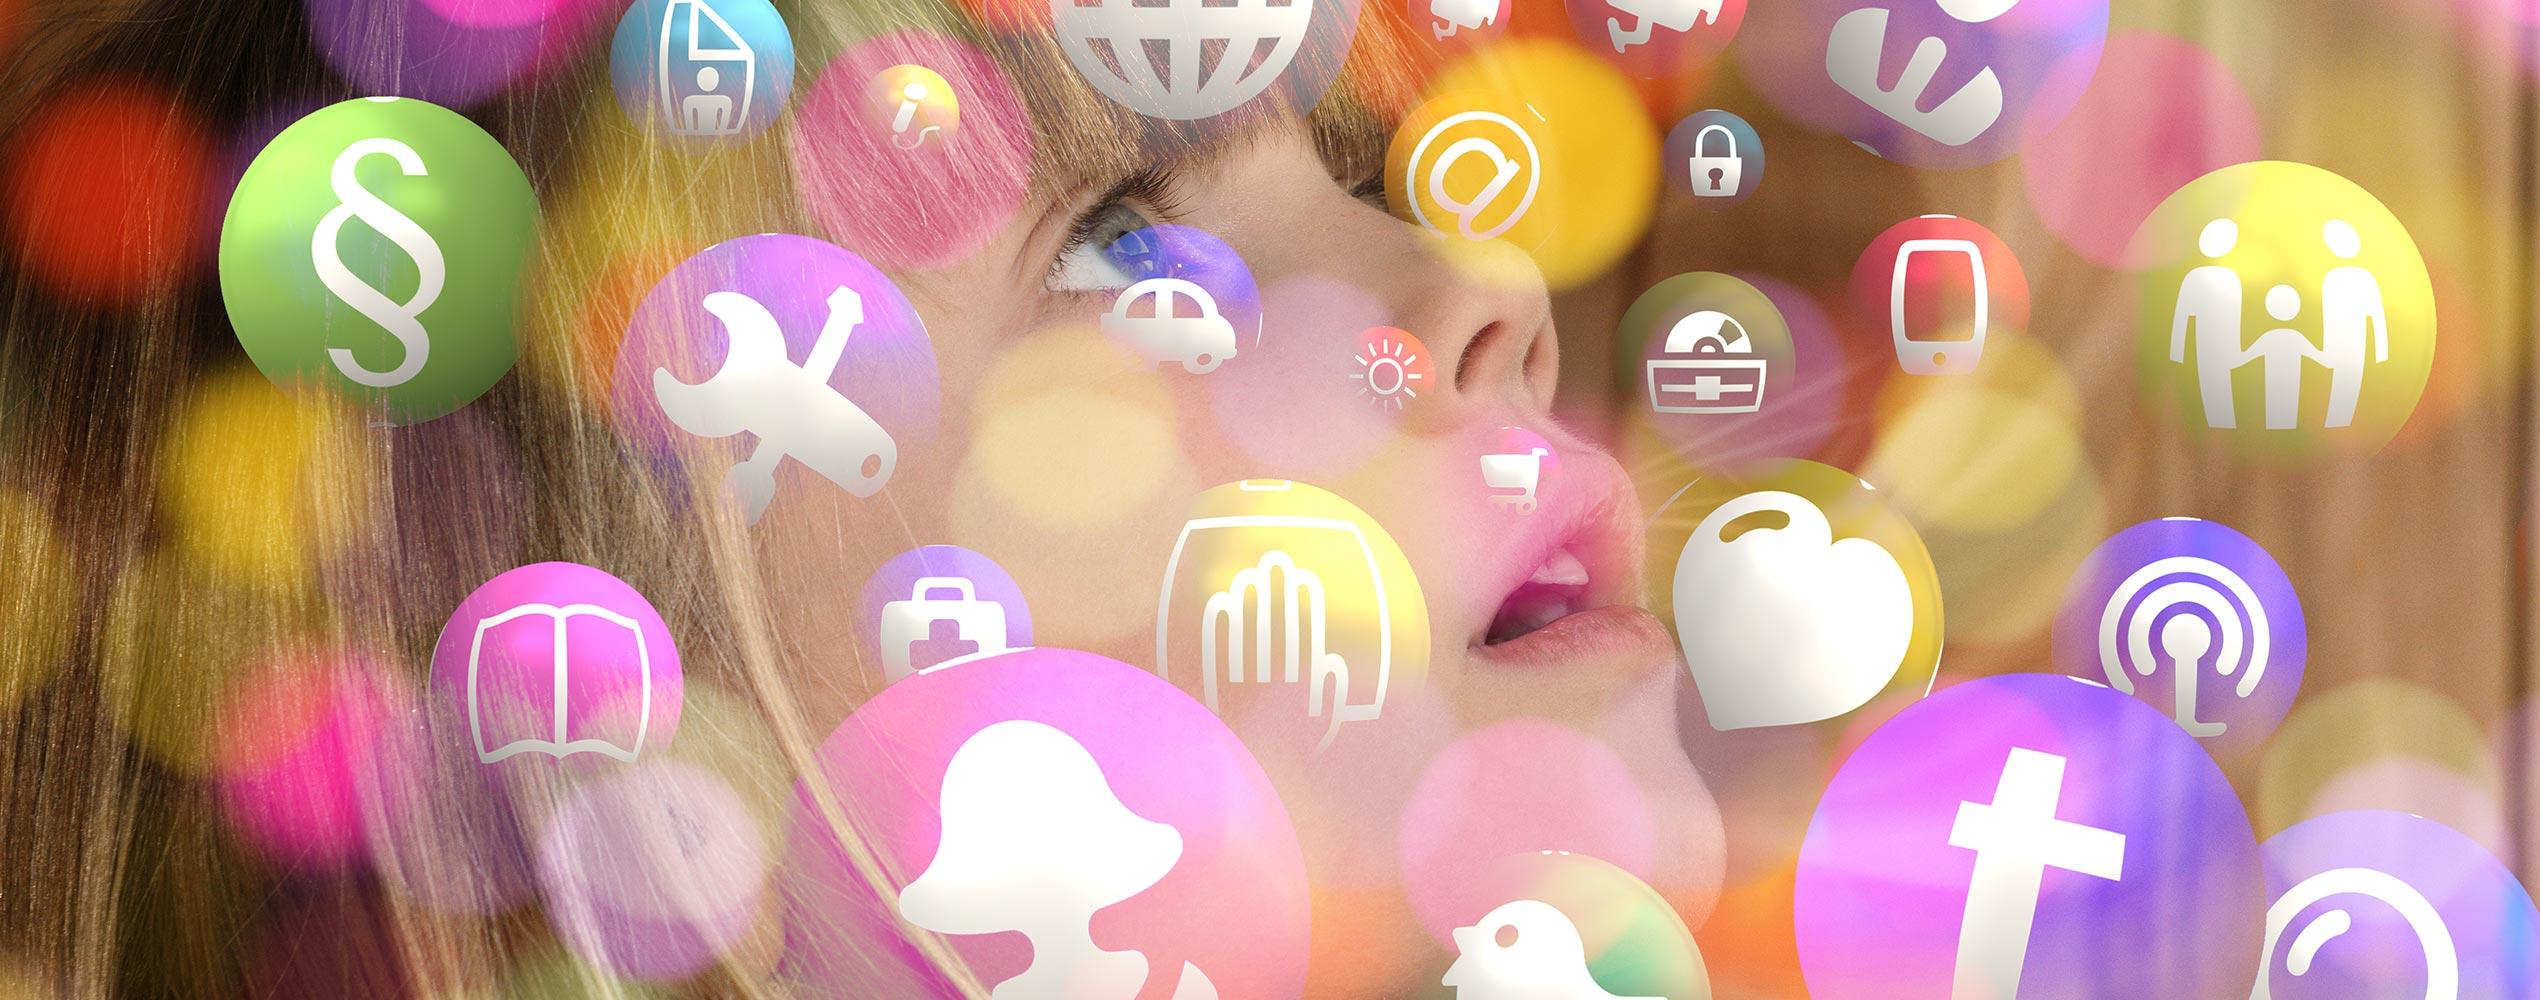 pixabay Maedchen Kind Gesicht Social Media Icons Digital